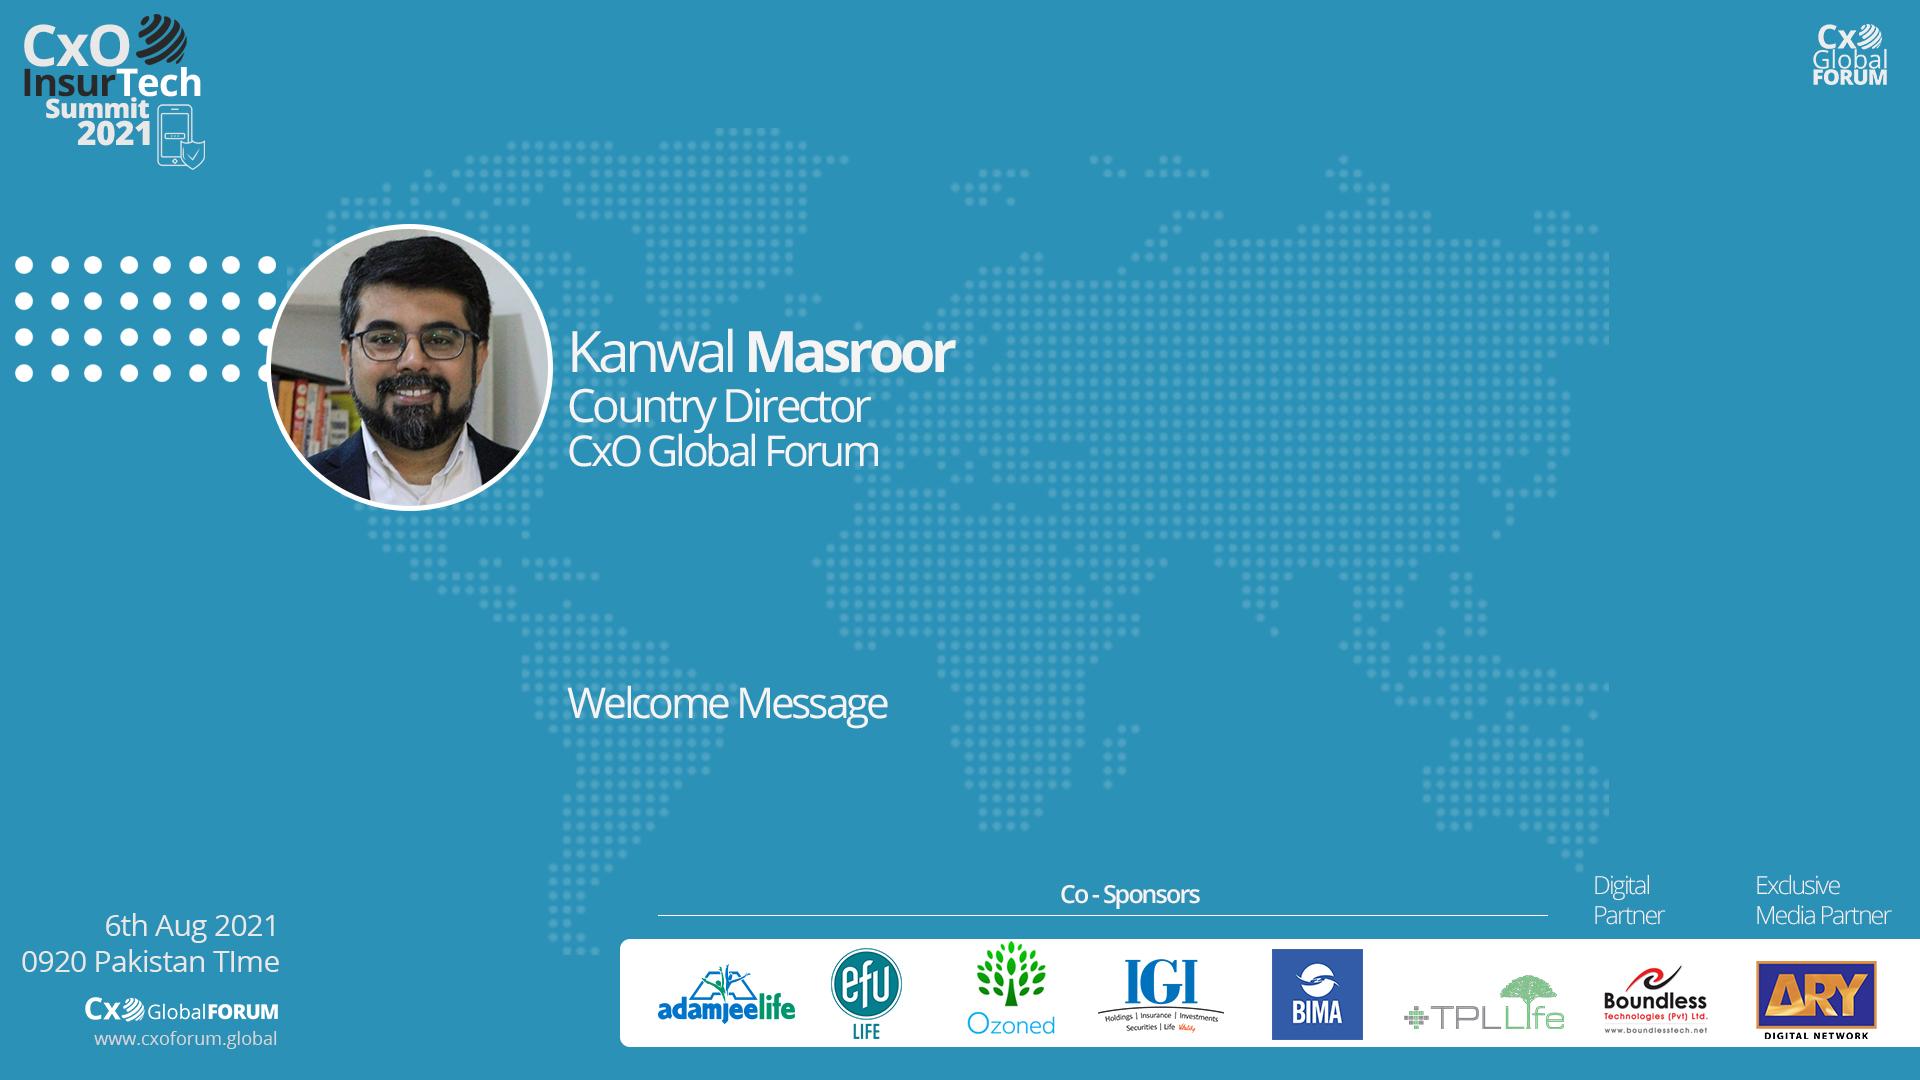 Welcome Note by Kanwal Masroor